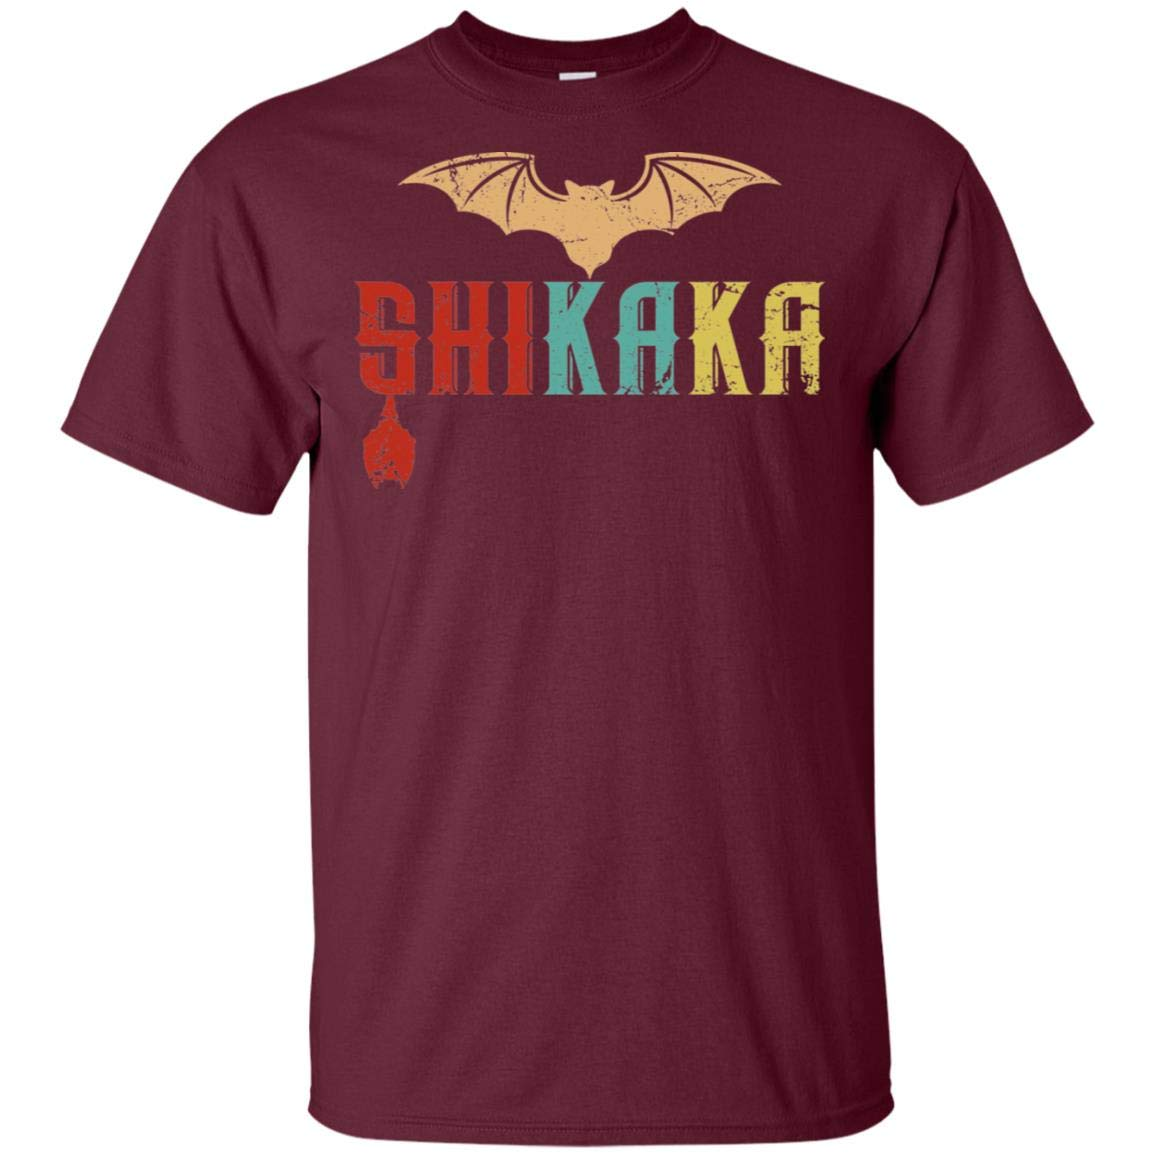 Shikaka Vintage Retro T Shirt